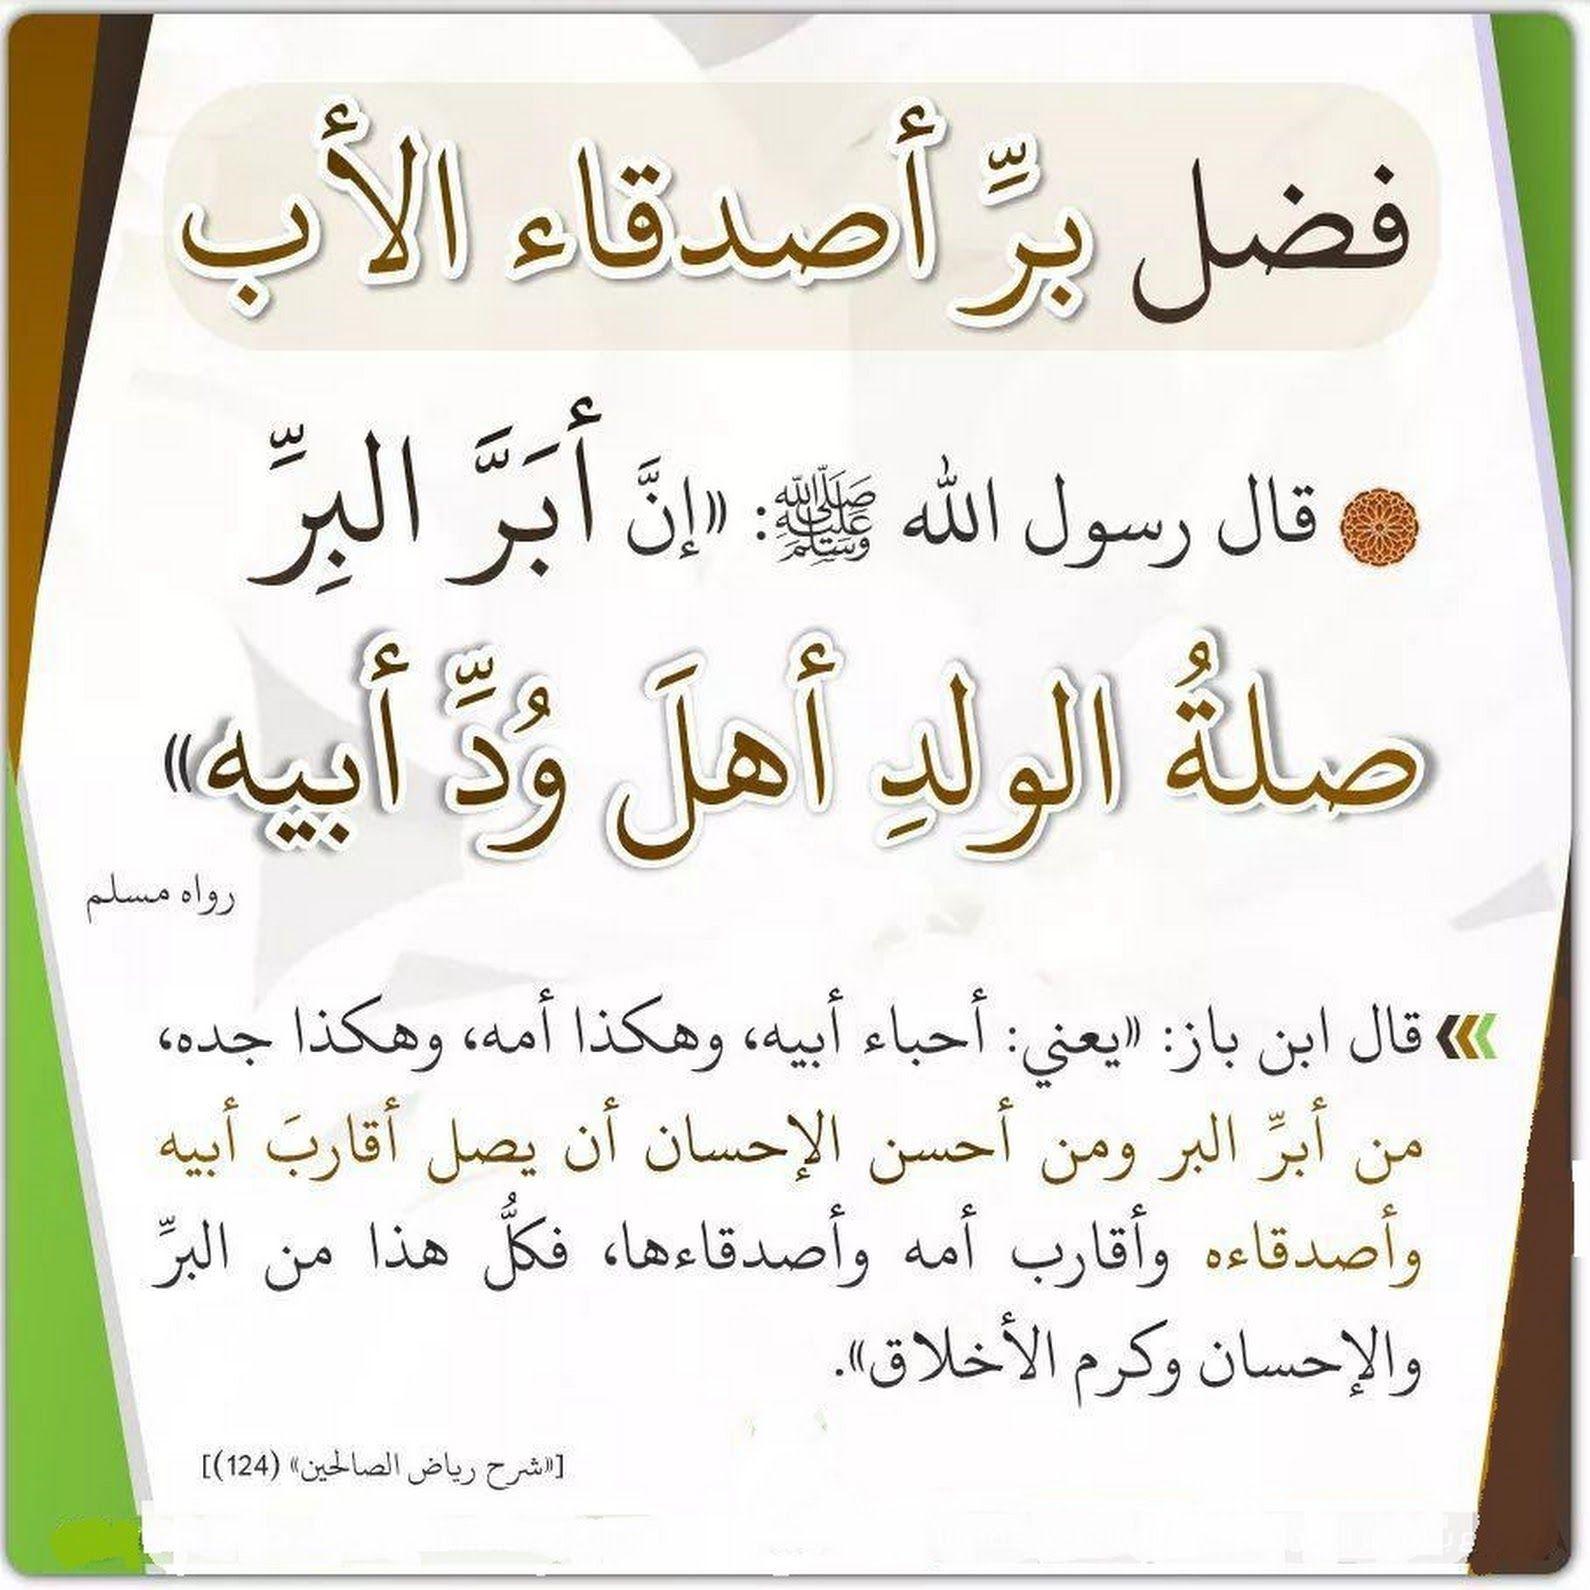 Pin By الأثر الجميل On أحاديث نبوية Arabic Love Quotes Hadith Sayings